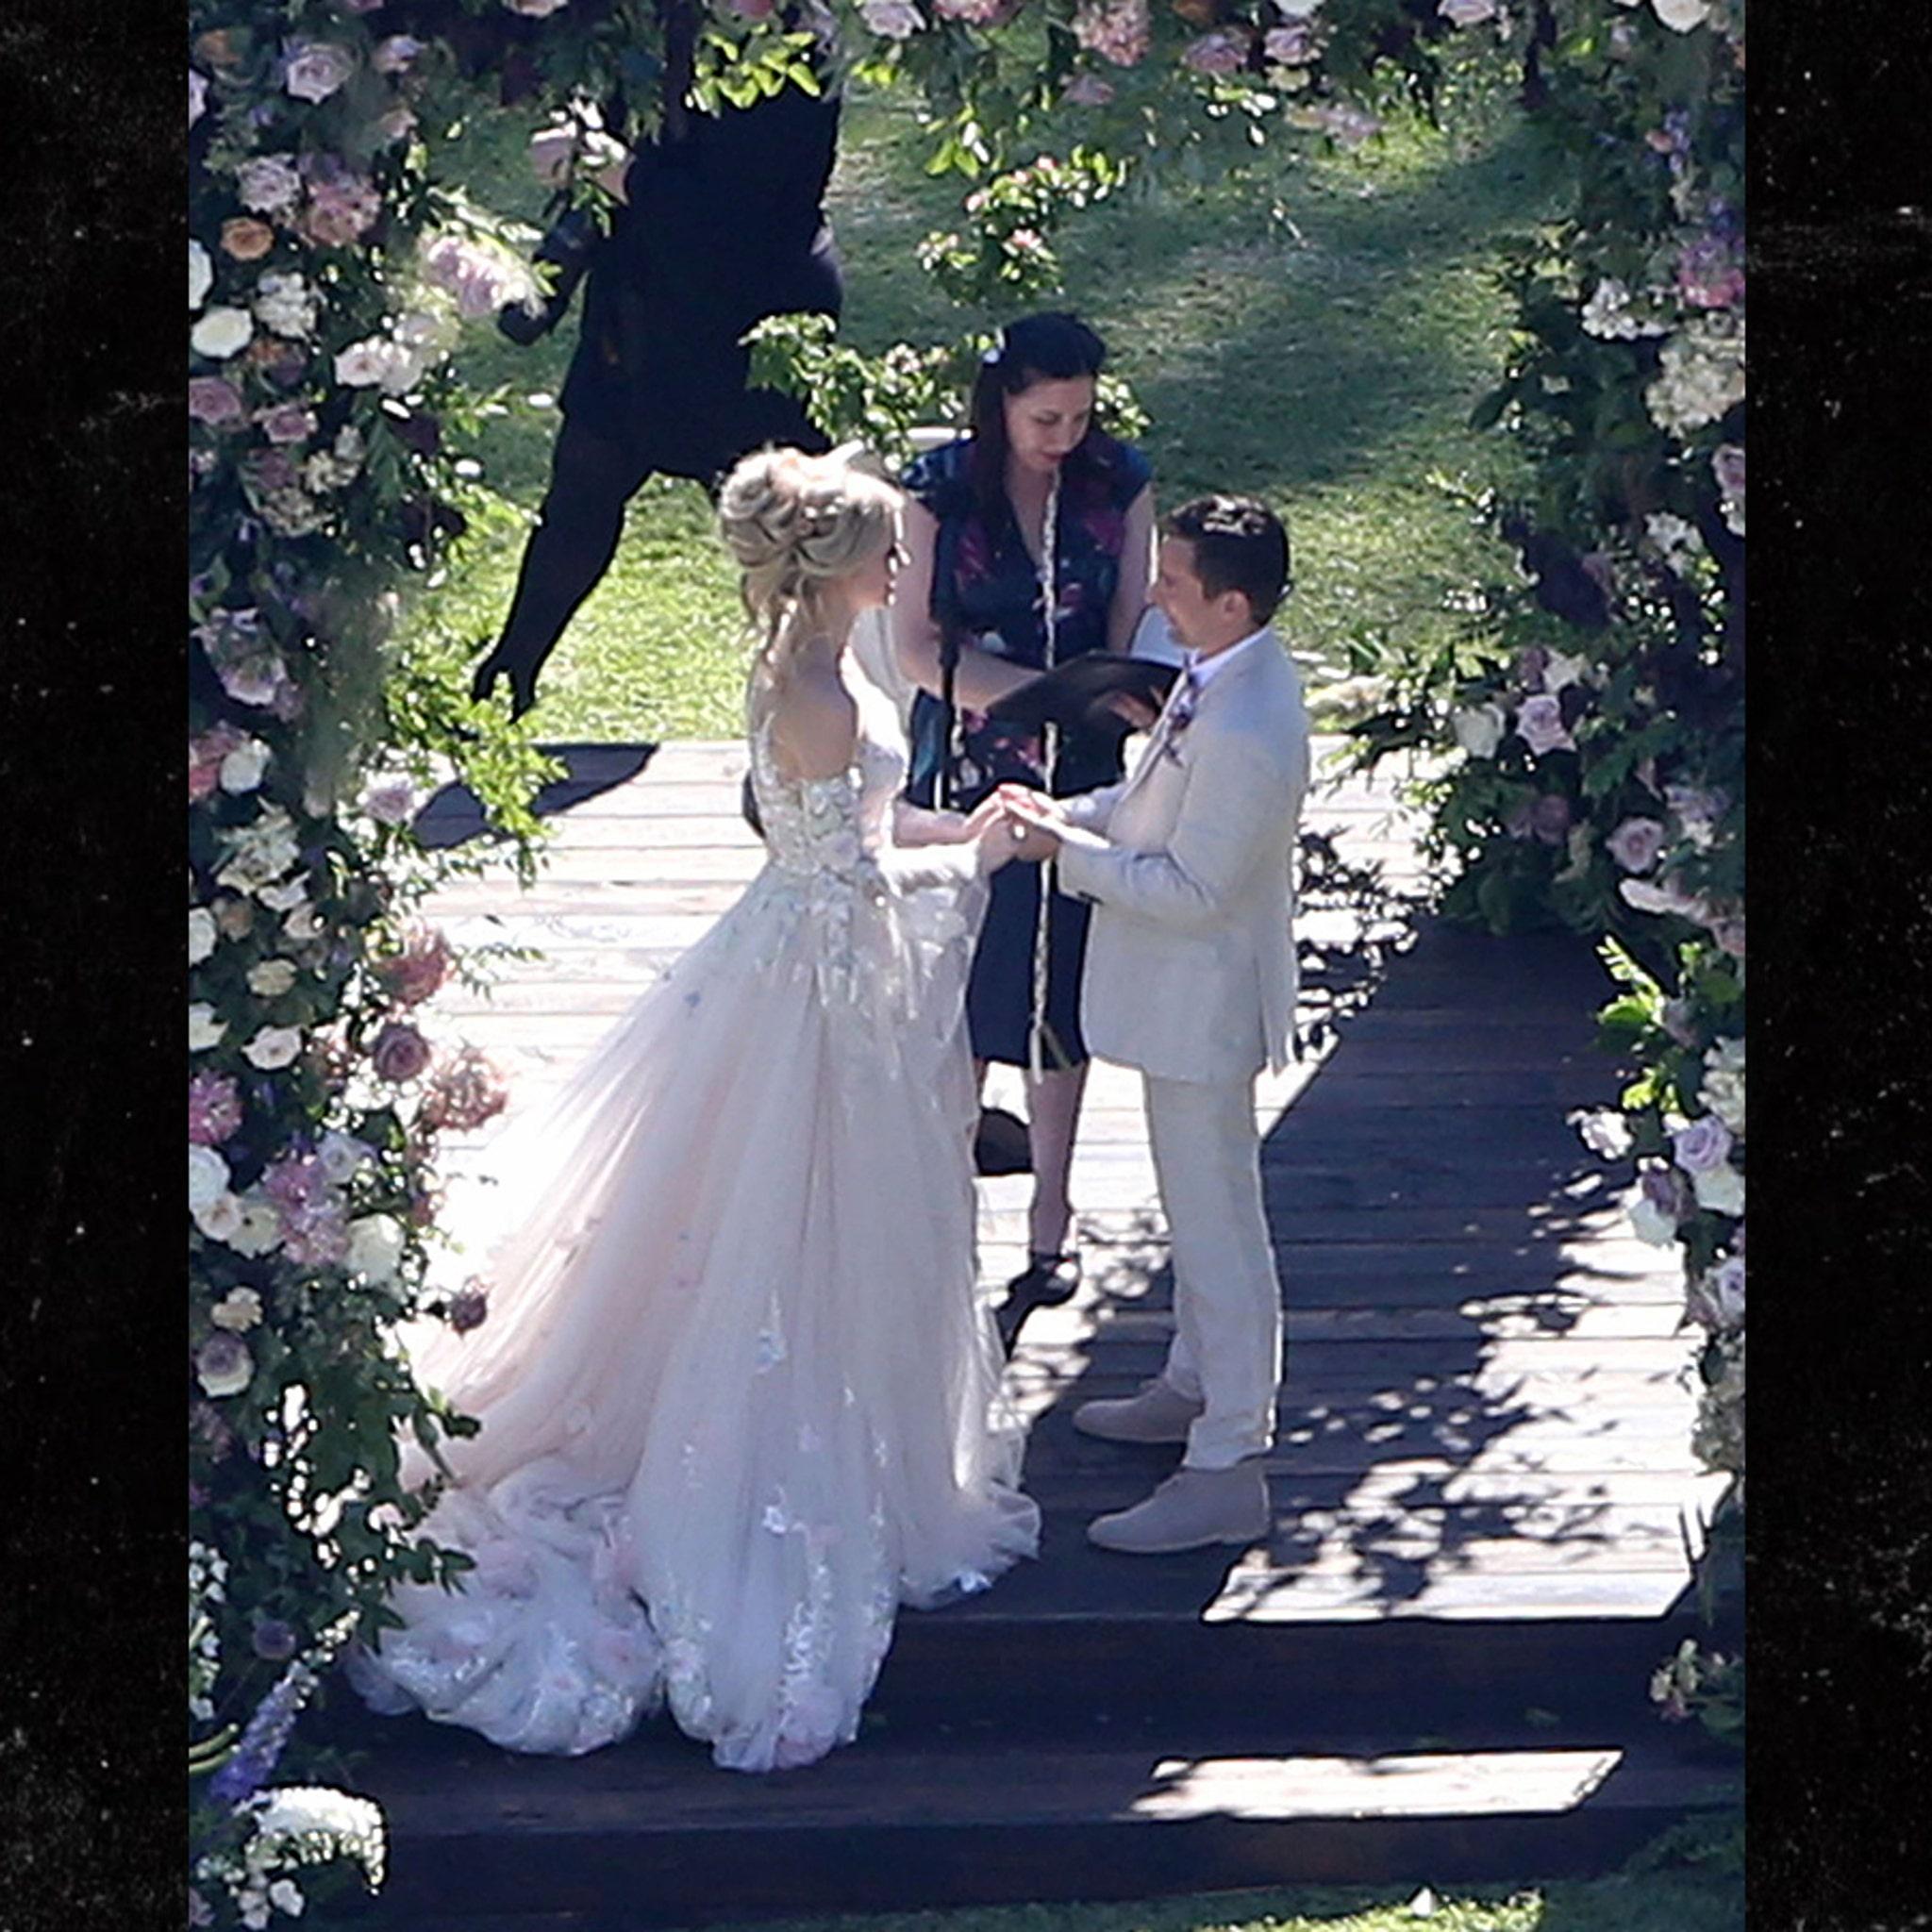 Muse Frontman Matt Bellamy Marries Girlfriend Elle Evans